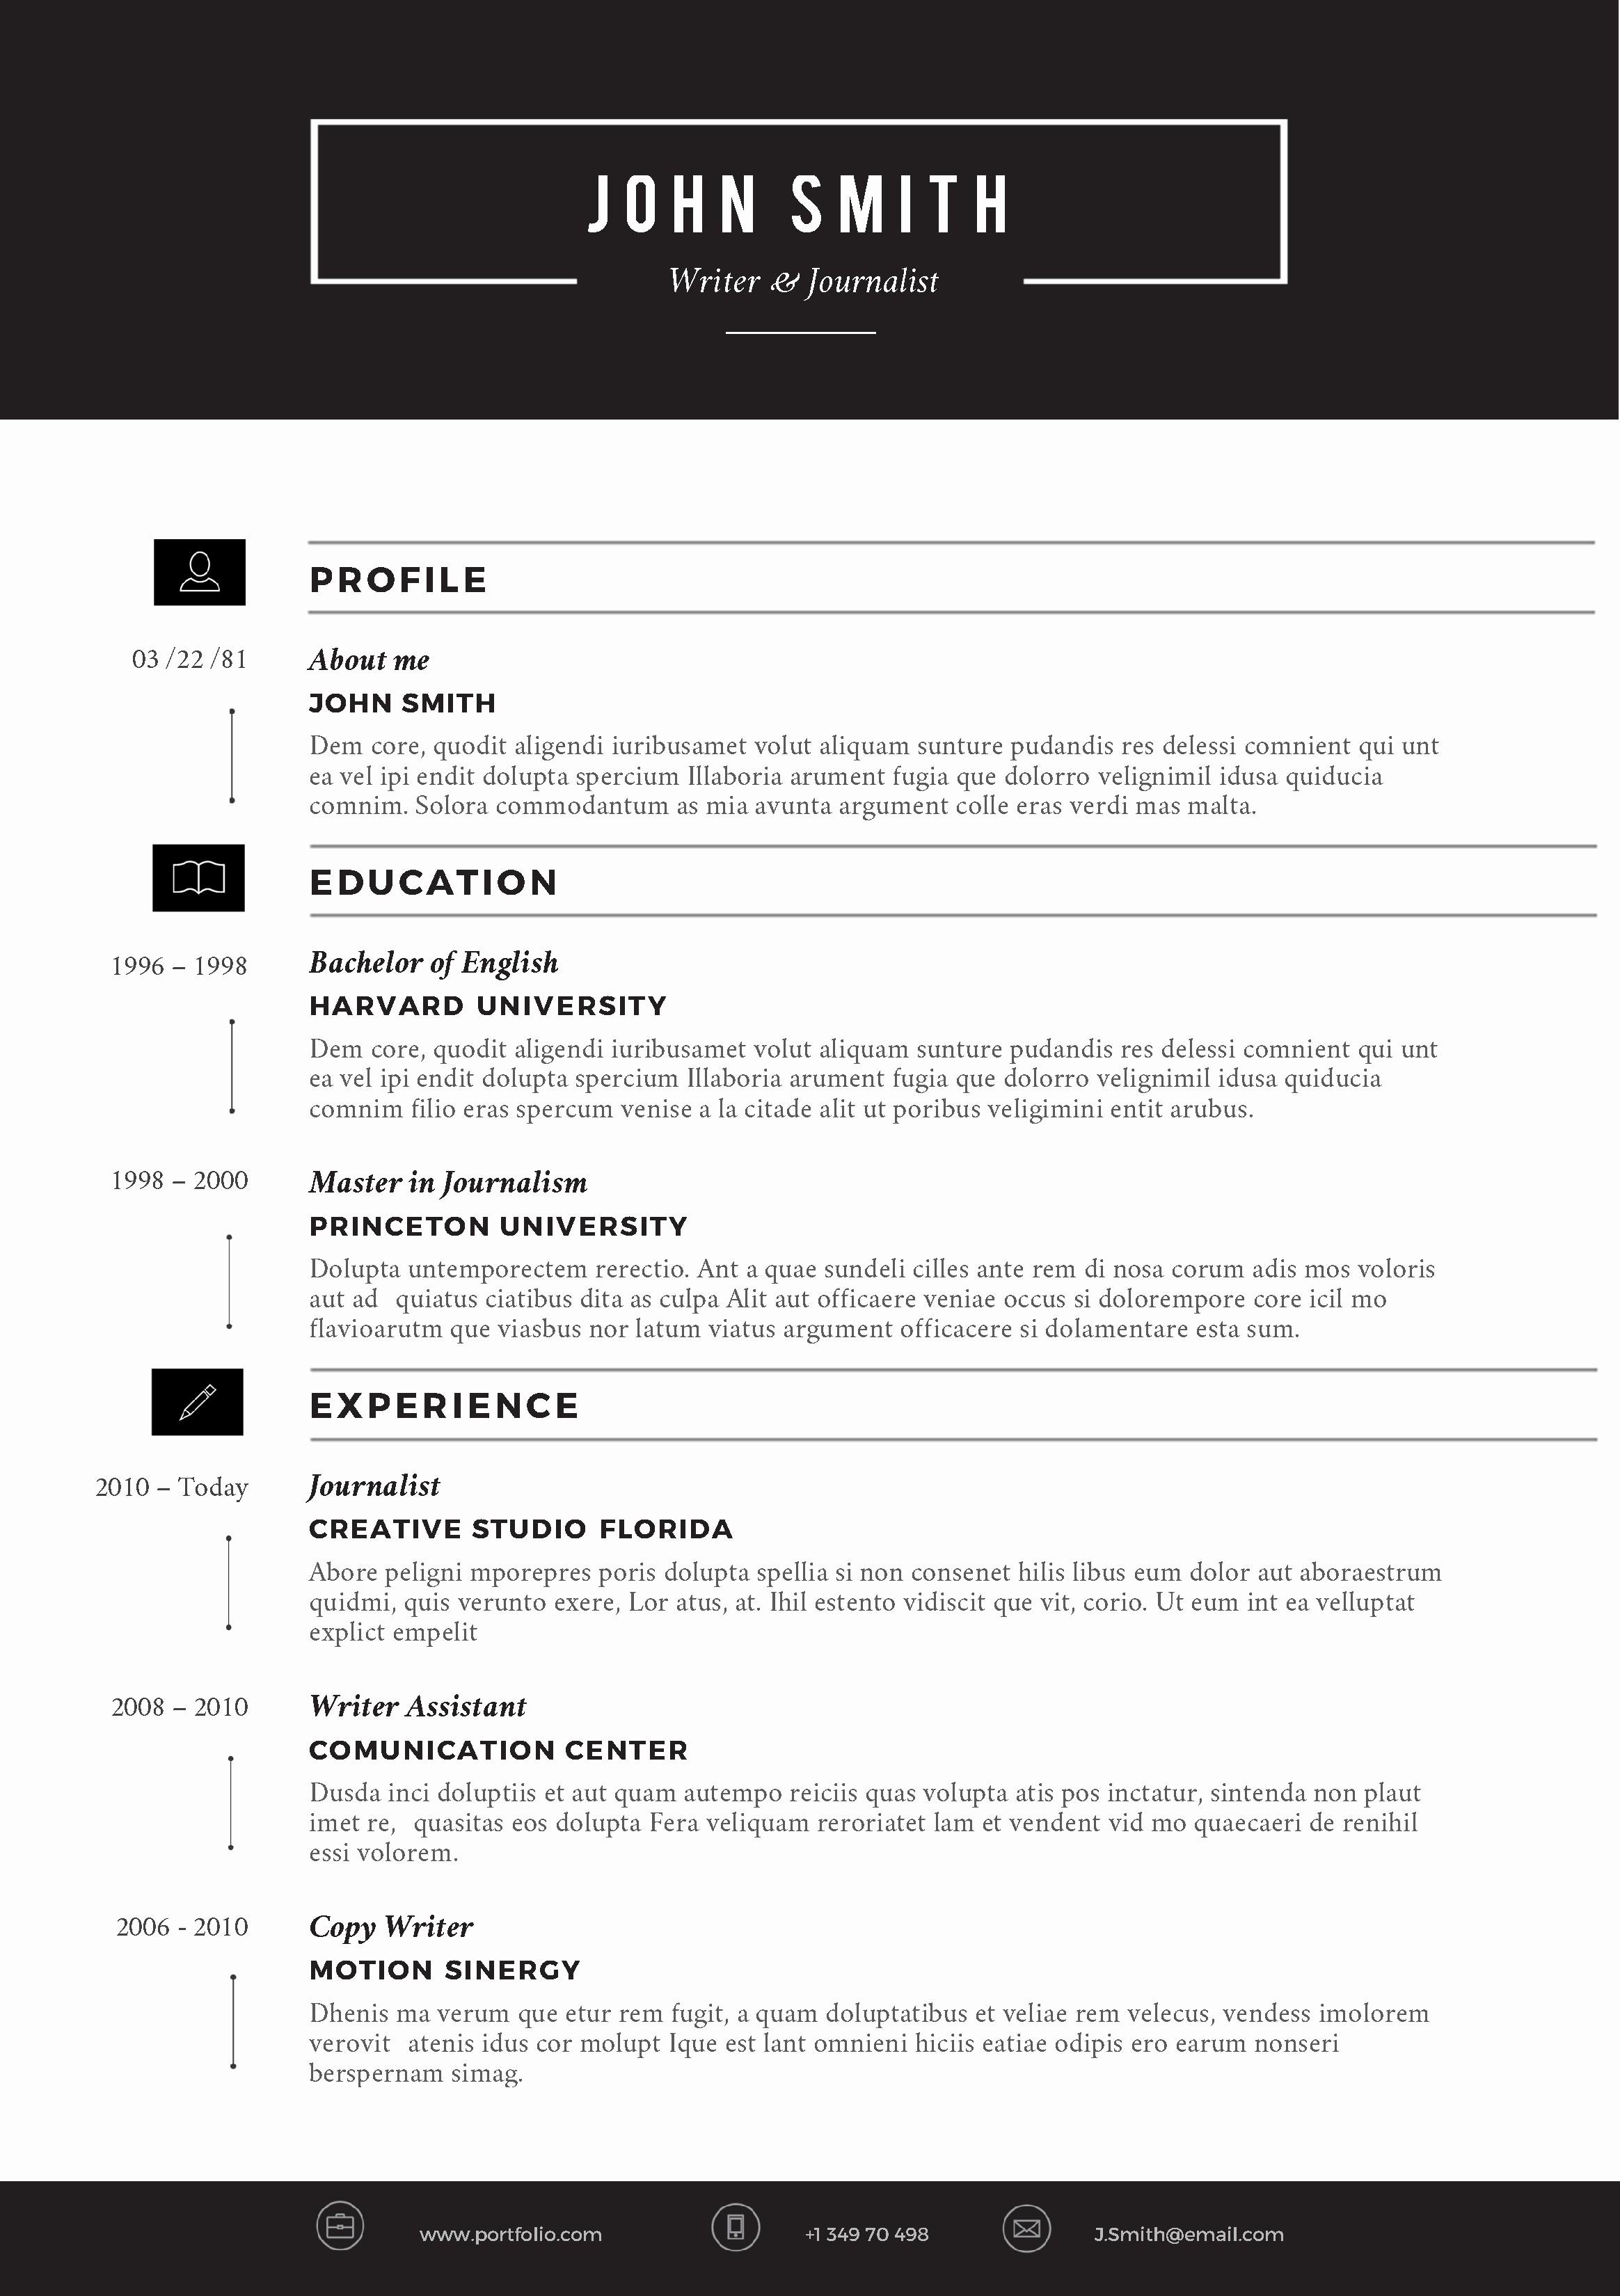 Resume Template On Microsoft Word Luxury Creative Resume Template by Cvfolio Resumes